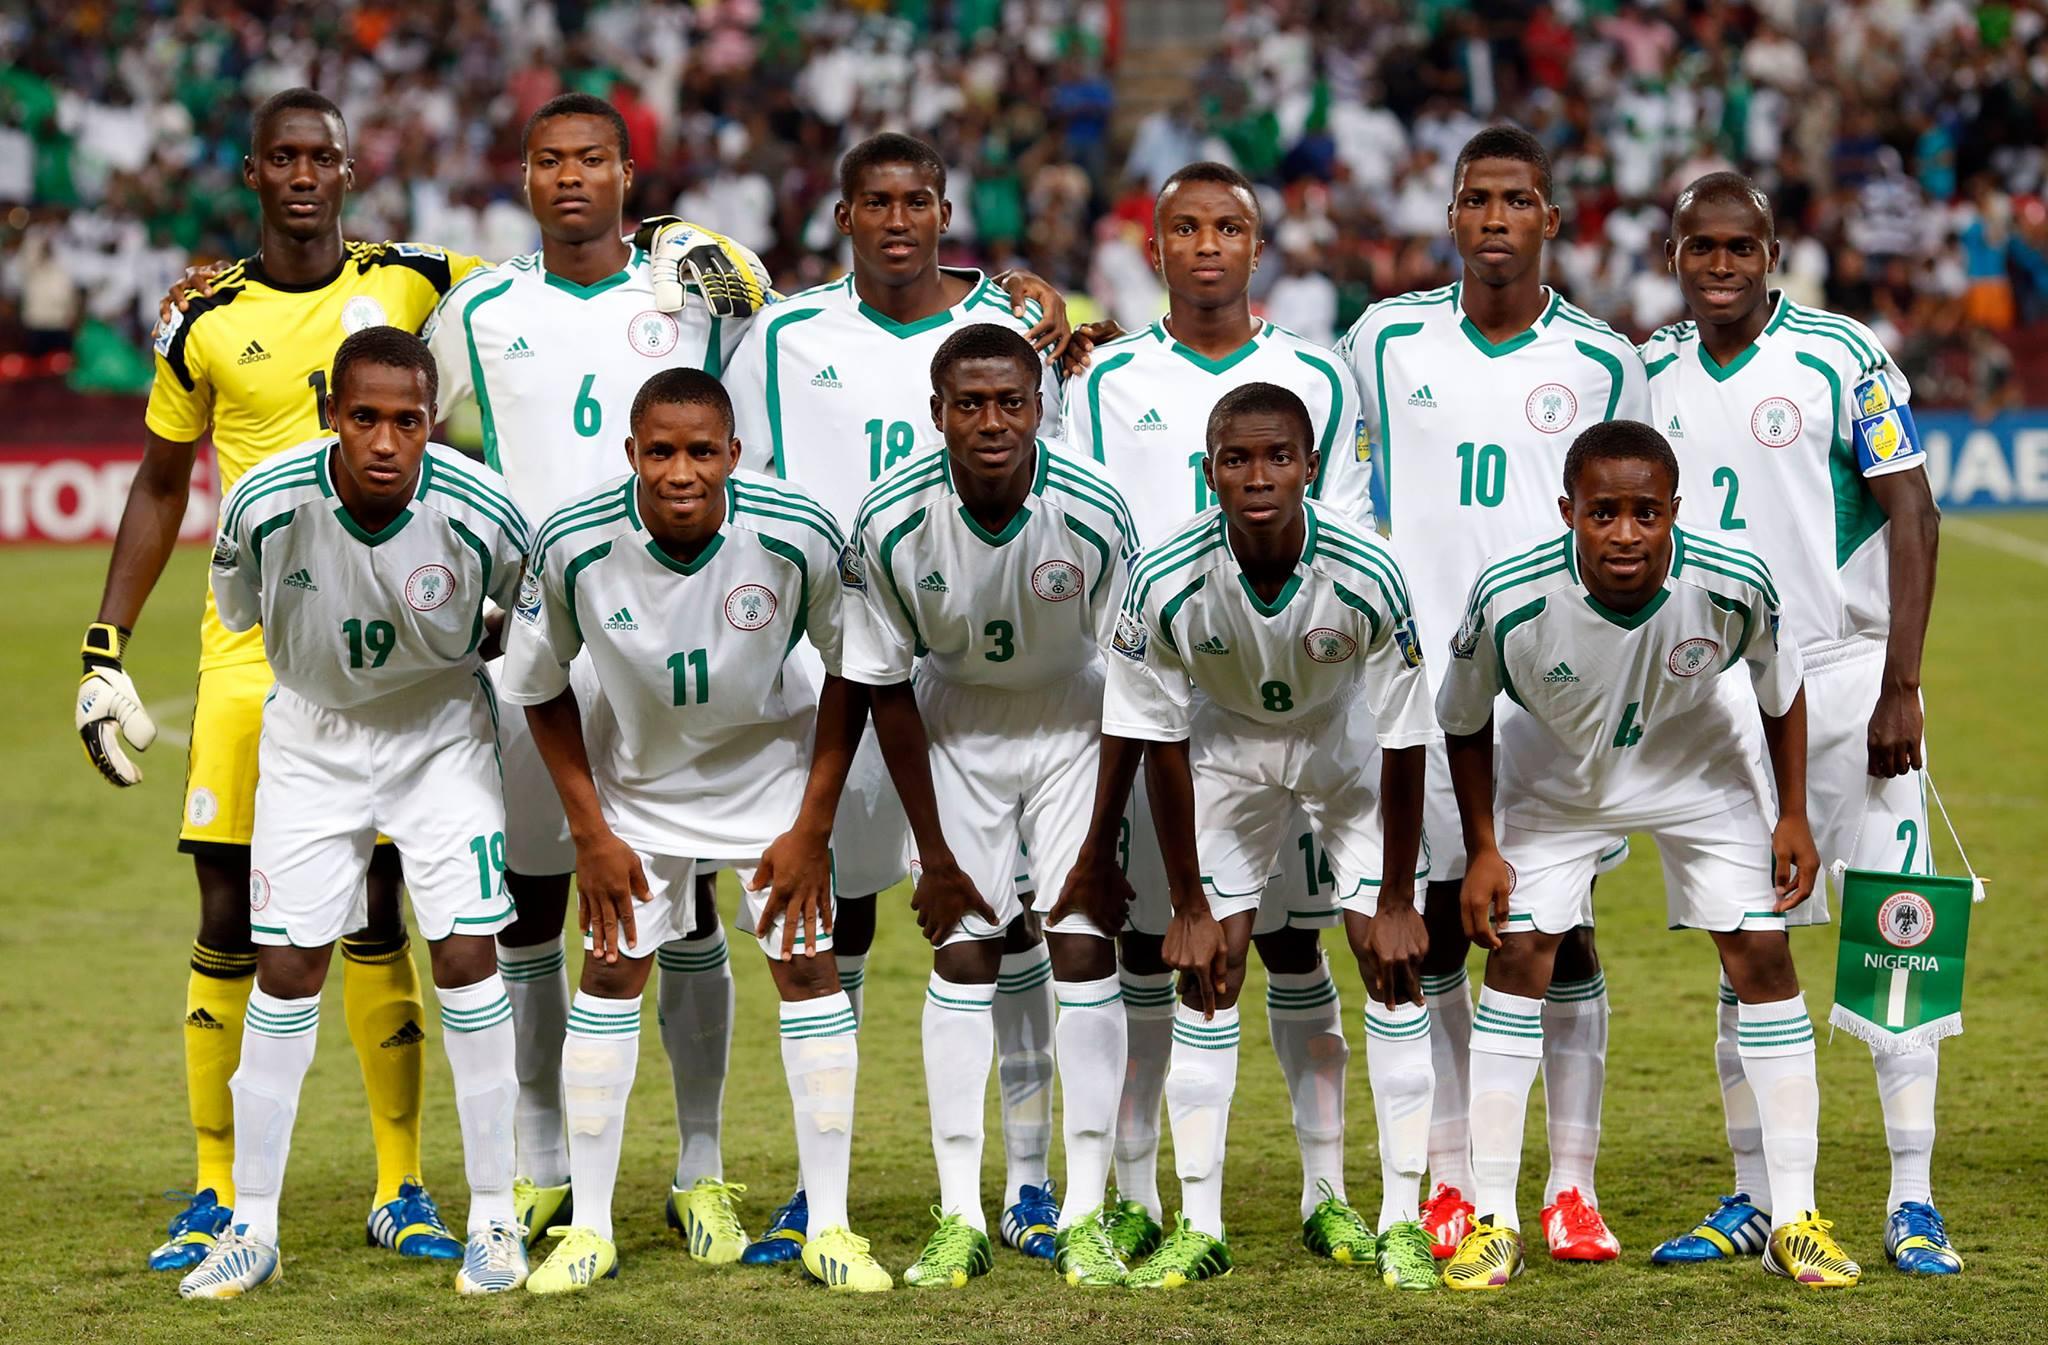 Nigeria National Football Team Teams Backgrounds 3